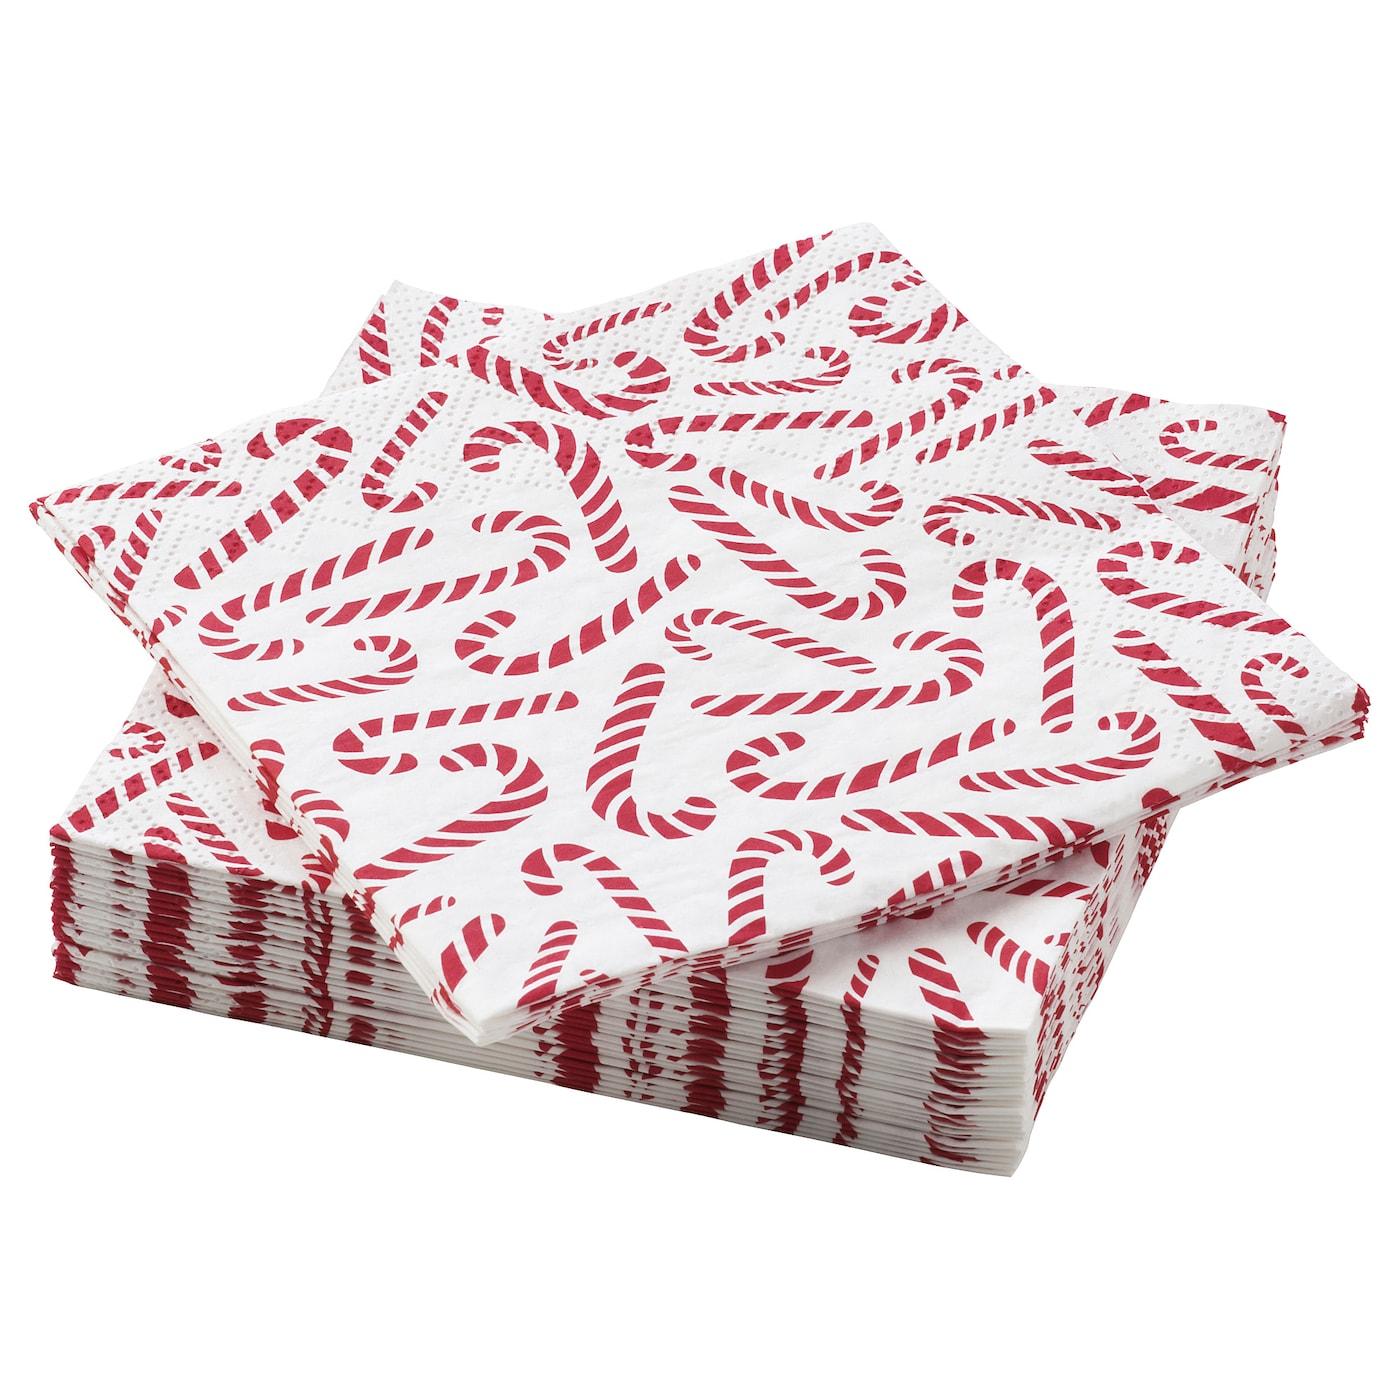 Paper Napkin Vinterfest Patterned Candy Cane